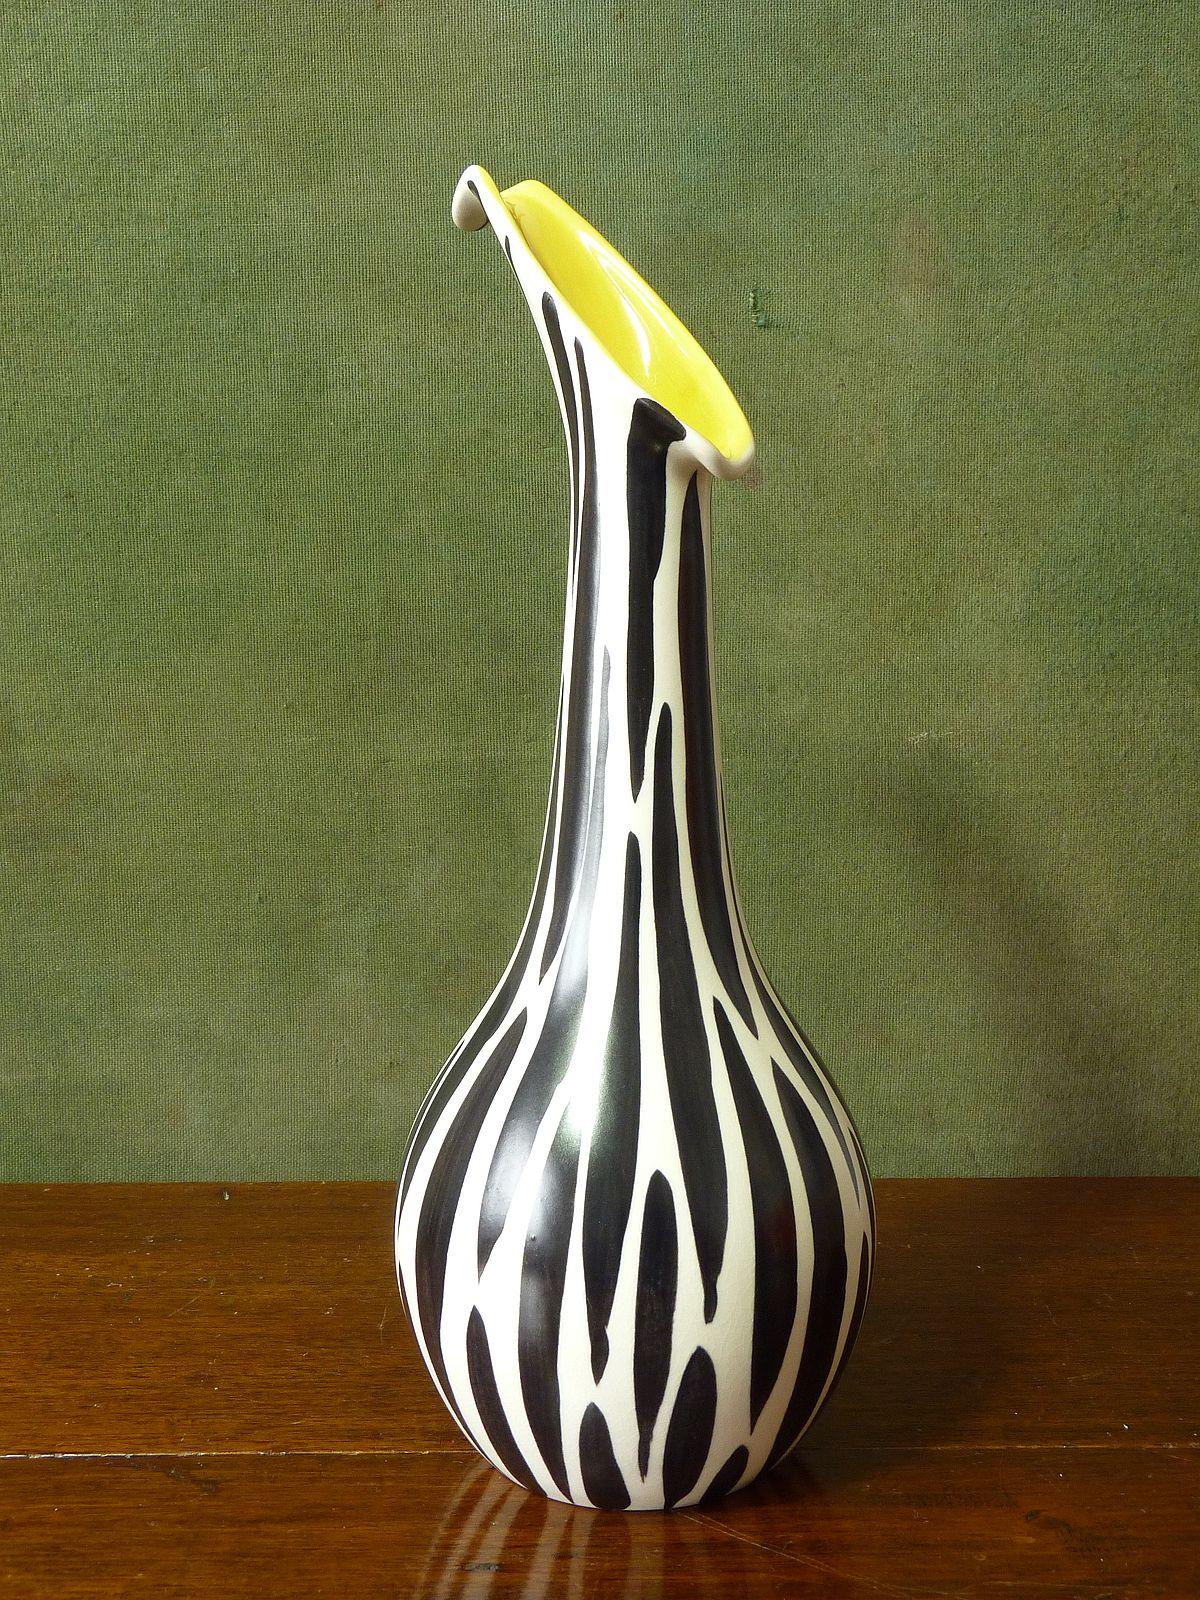 Beswick Zebra Pattern Vase 1455 Shape Yellow Interior